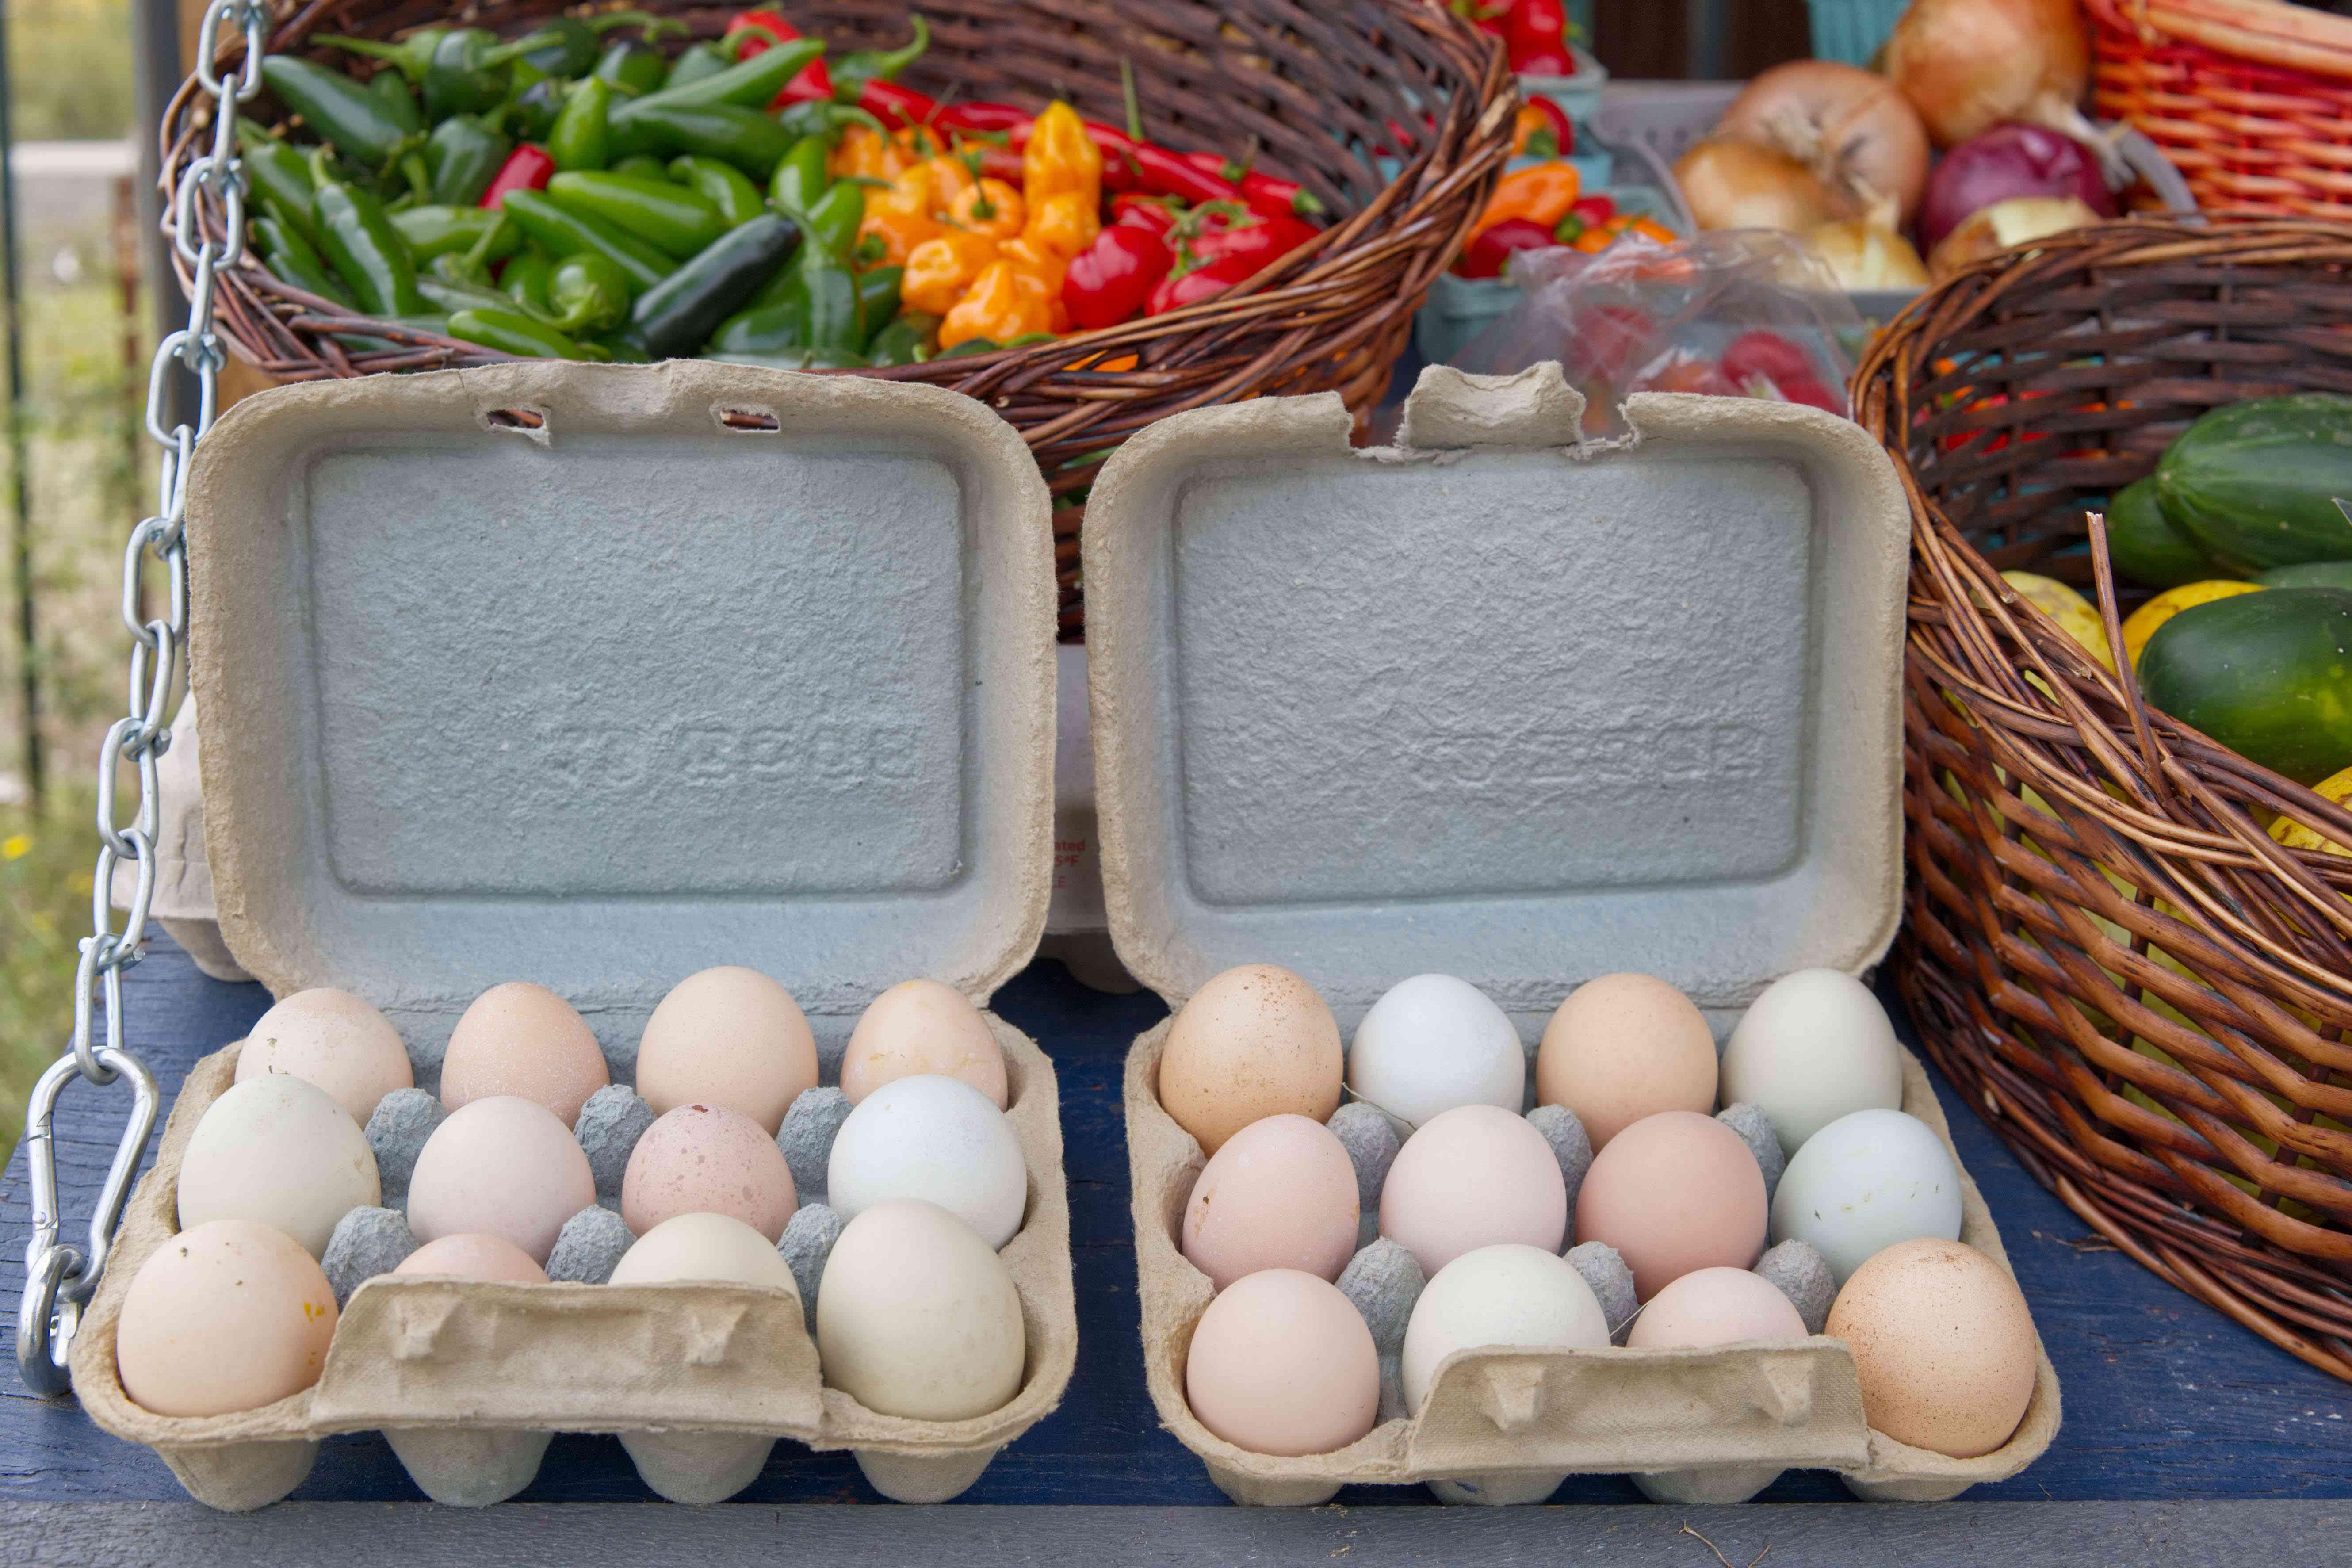 two dozen farm fresh eggs for sale at outside farmers market